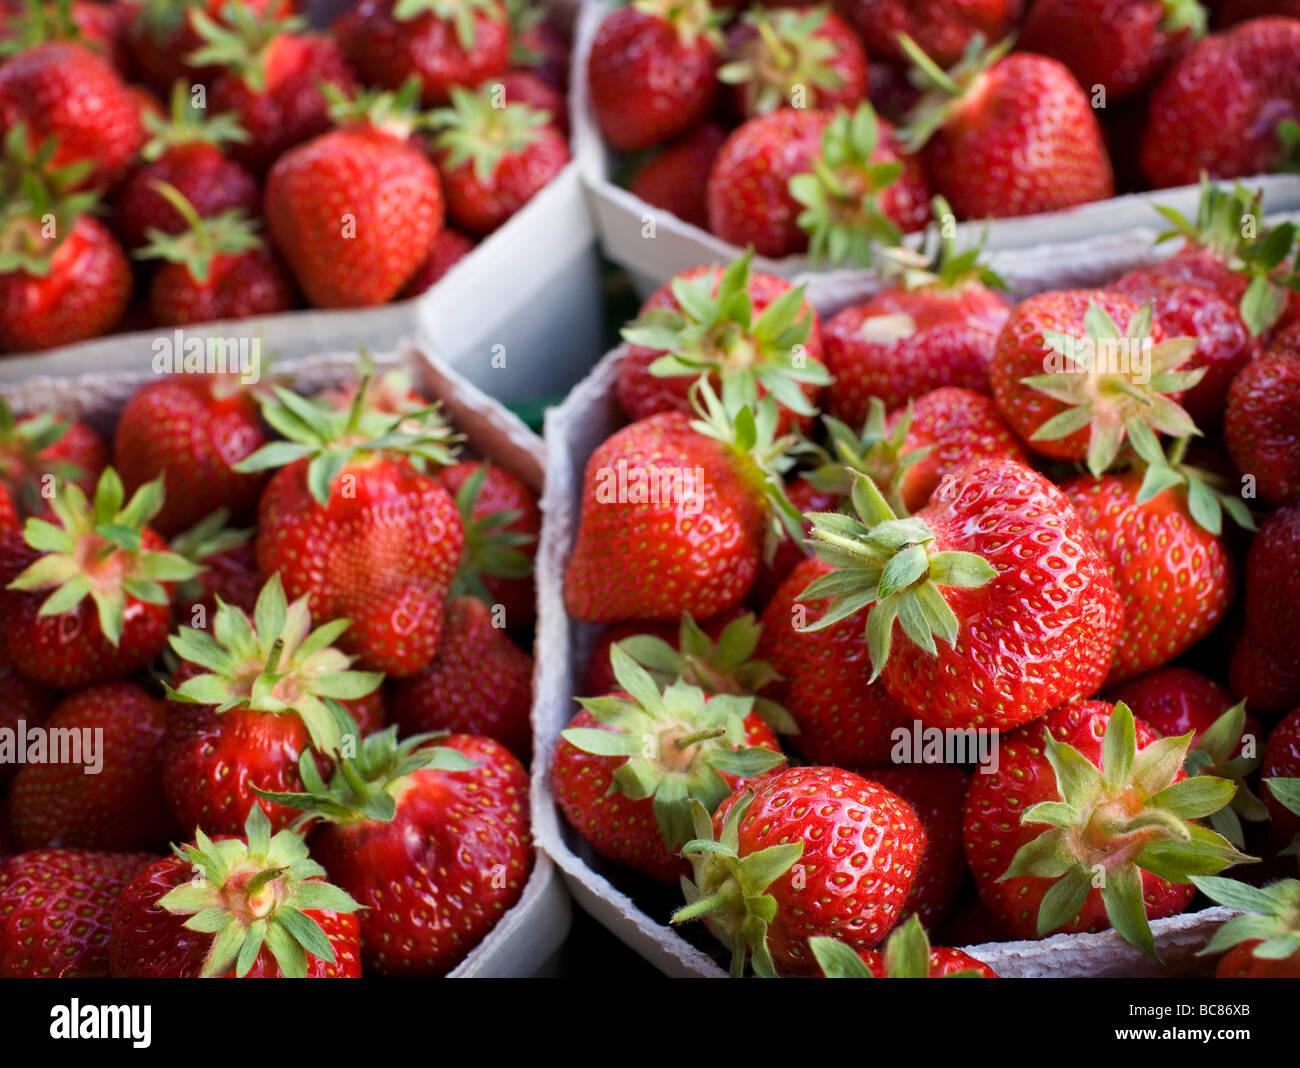 Strawberries - Stock Image